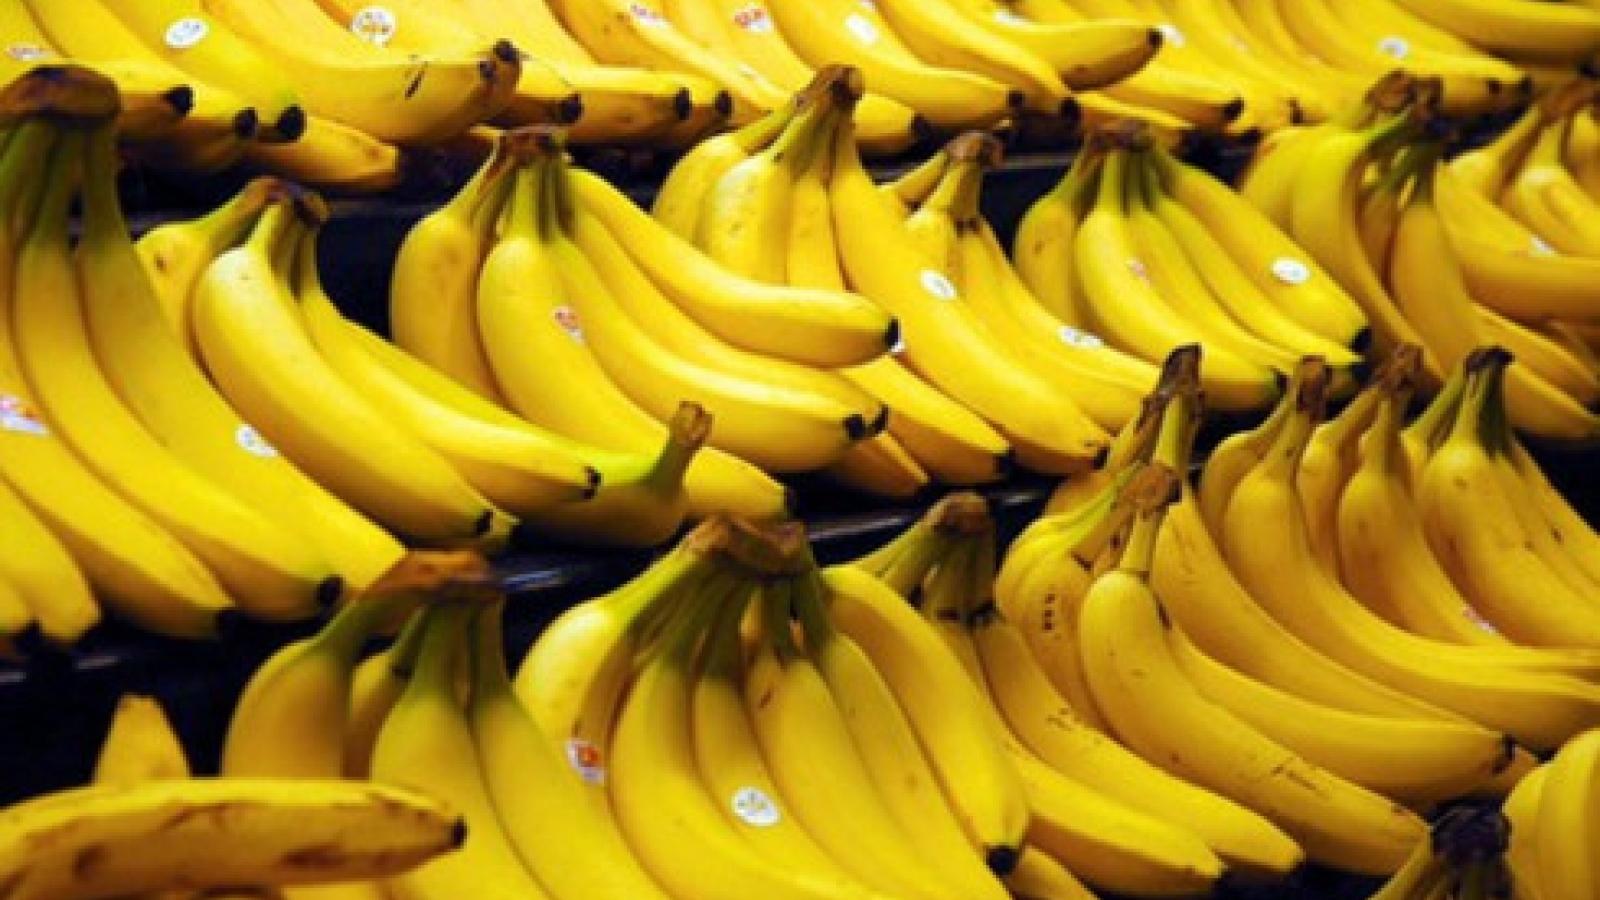 RoK increases banana imports from Vietnamese market